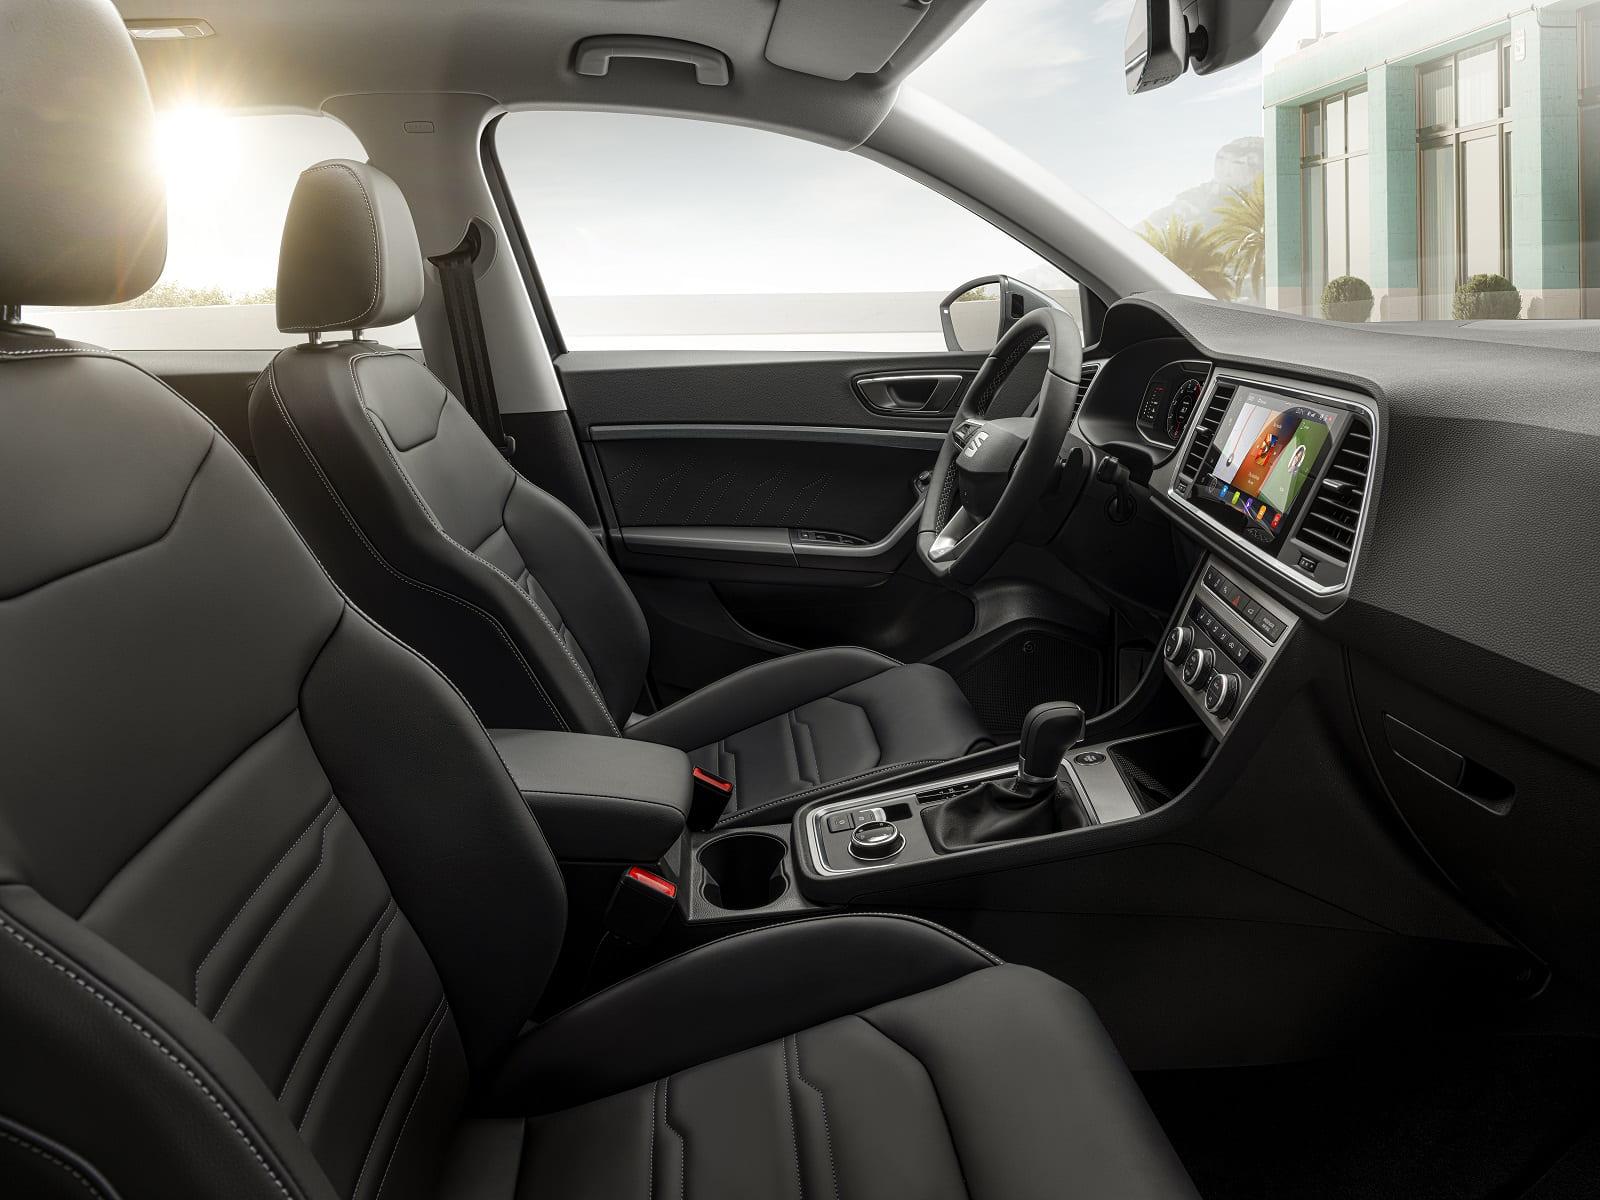 seat-ateca-2020-innen-cockpit